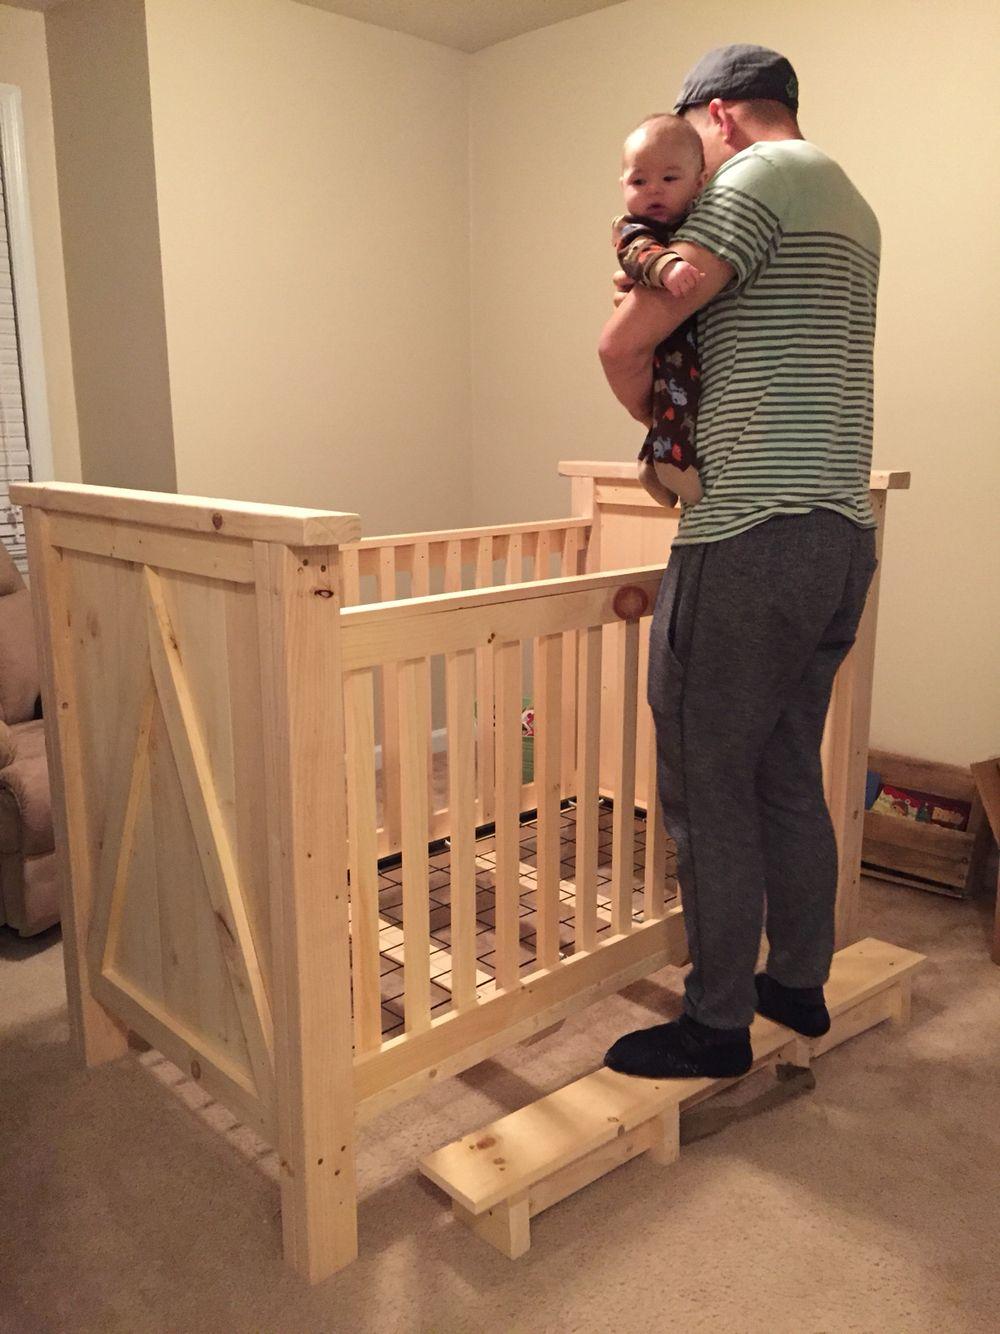 Home Made Pine Wood Crib Before Stain Diy Crib Diy Baby Furniture Baby Crib Diy Diy Crib